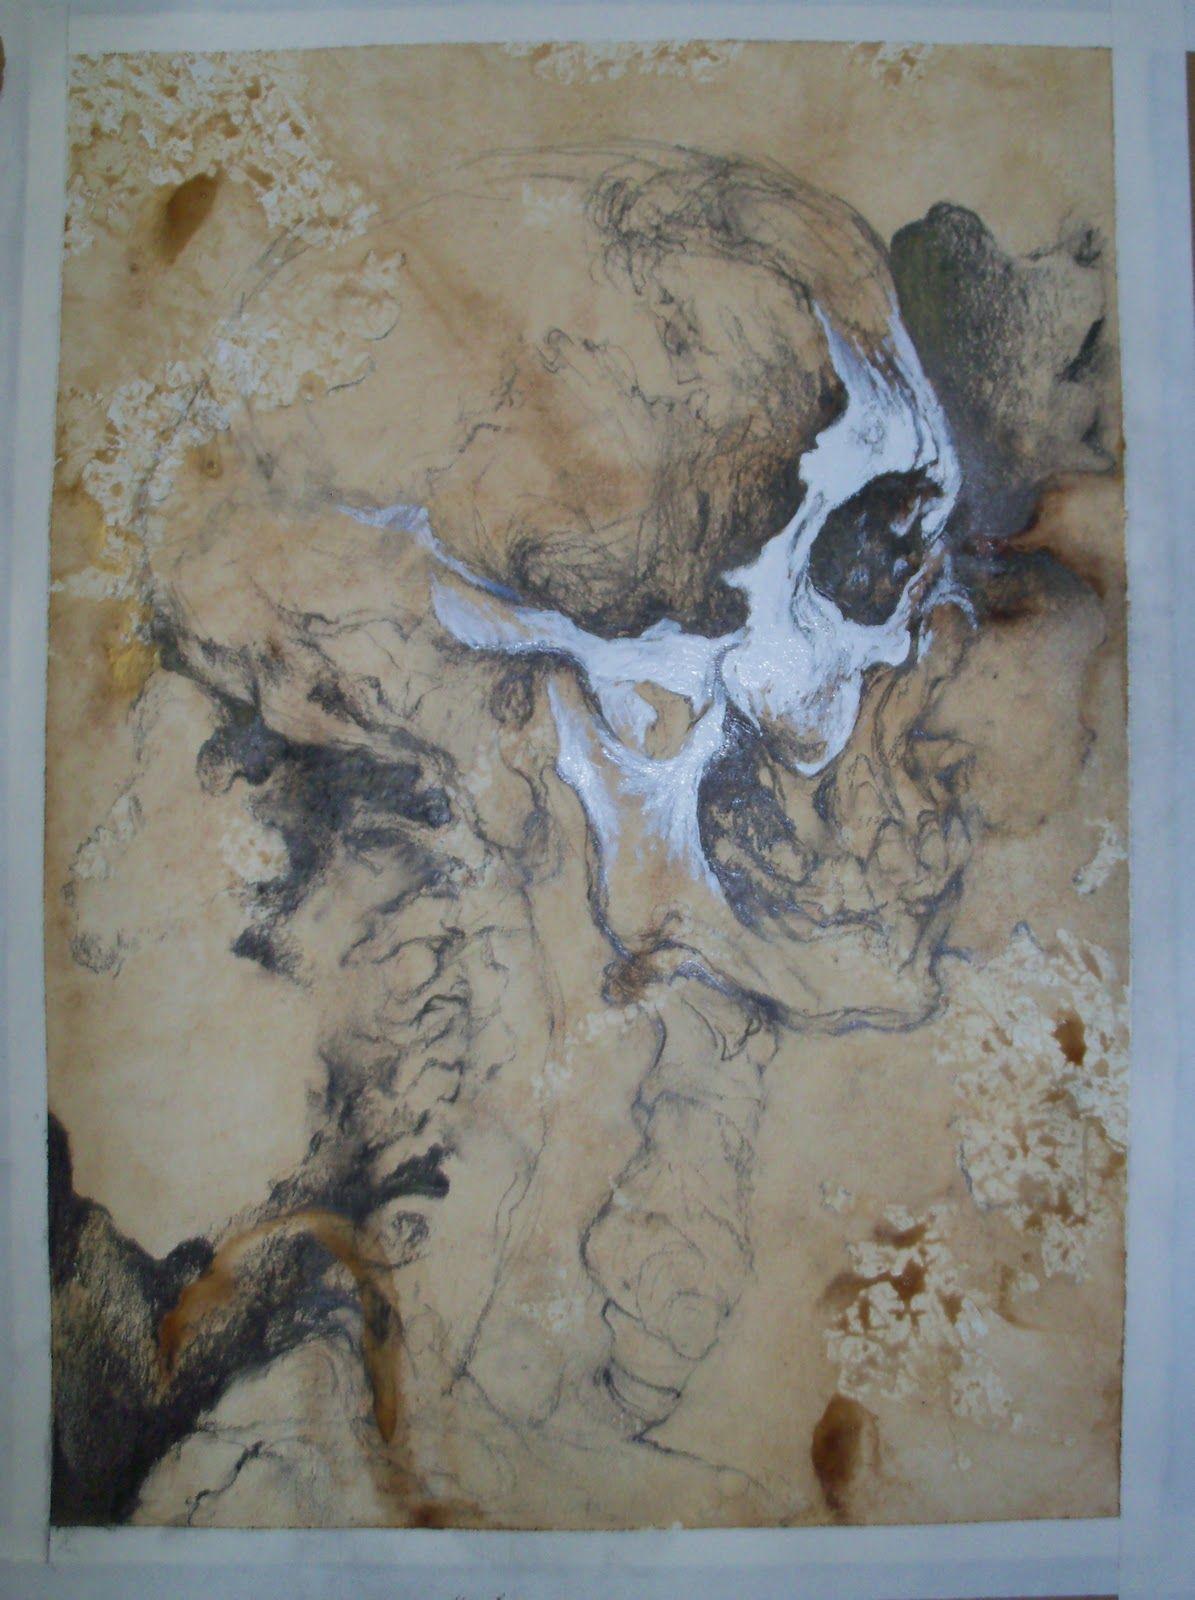 Sarah Simblet Anatomy | drawing. | Pinterest | Anatomía y Anatomía ...